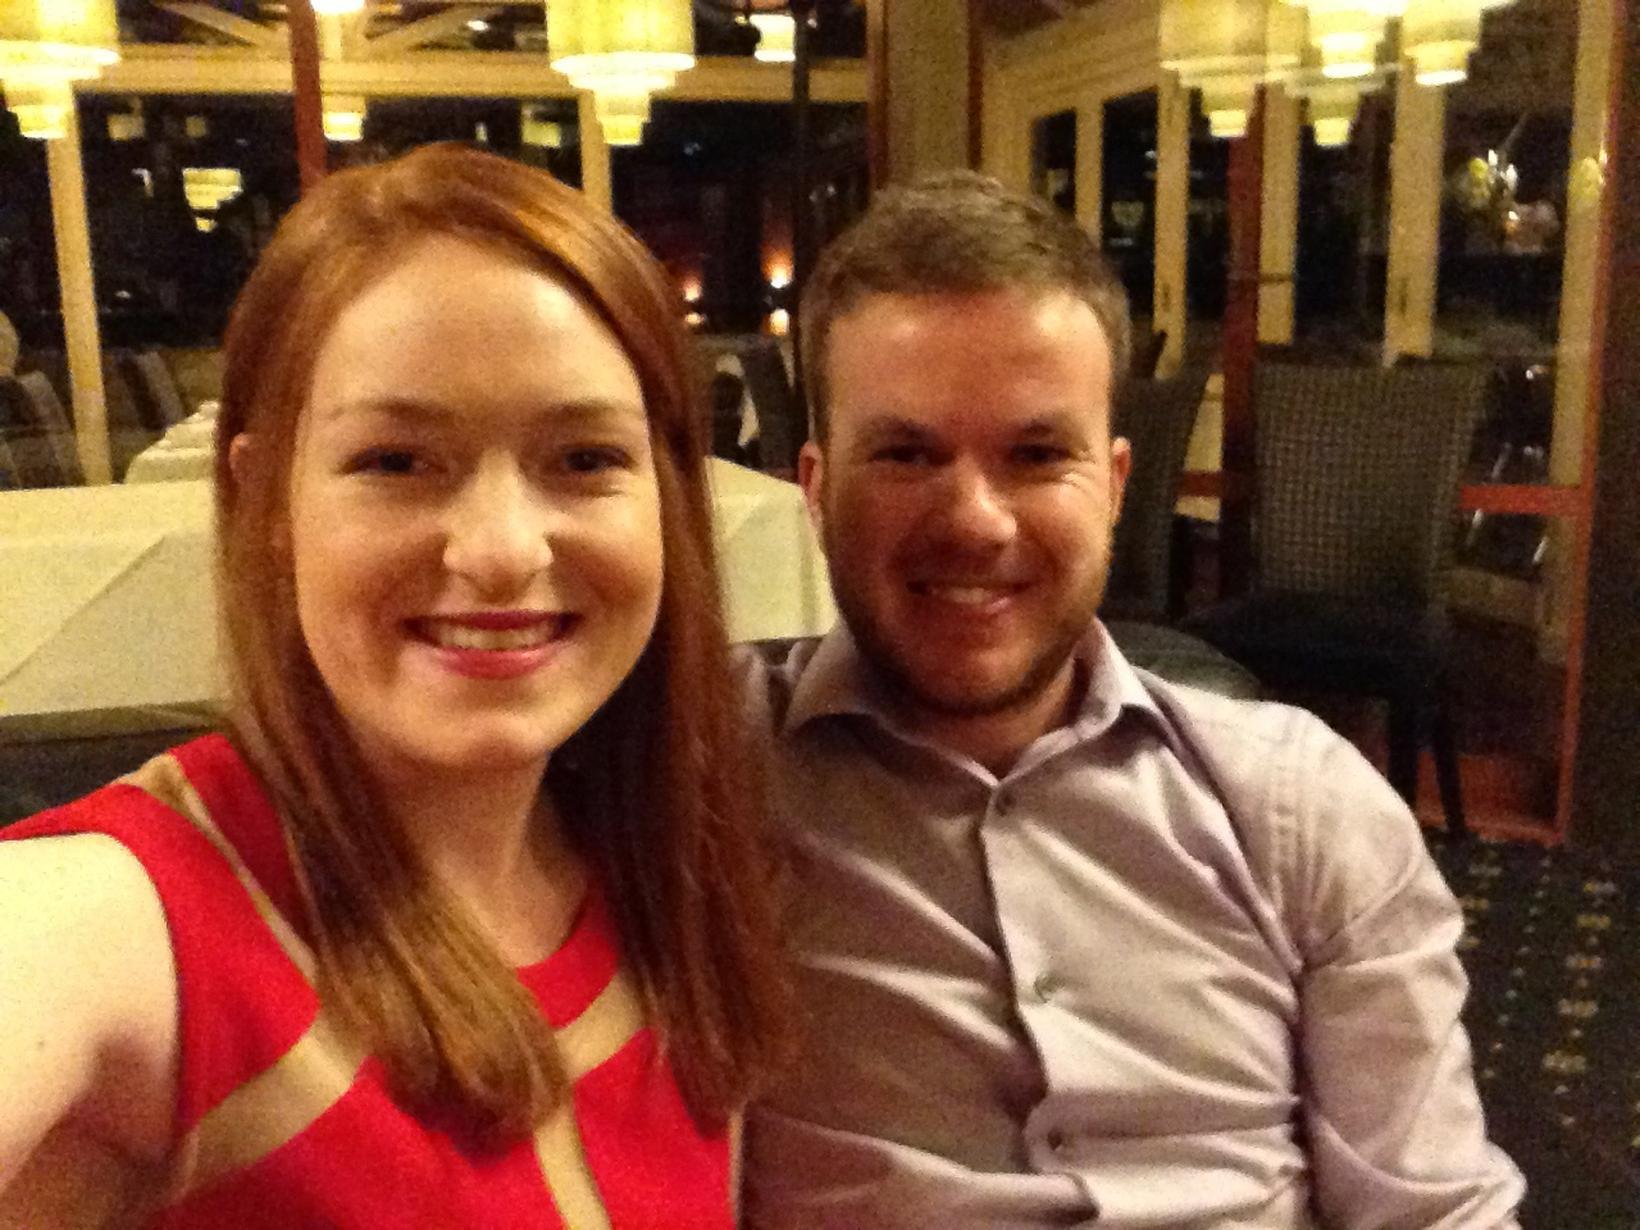 Eric & Miriam from Perth, Western Australia, Australia